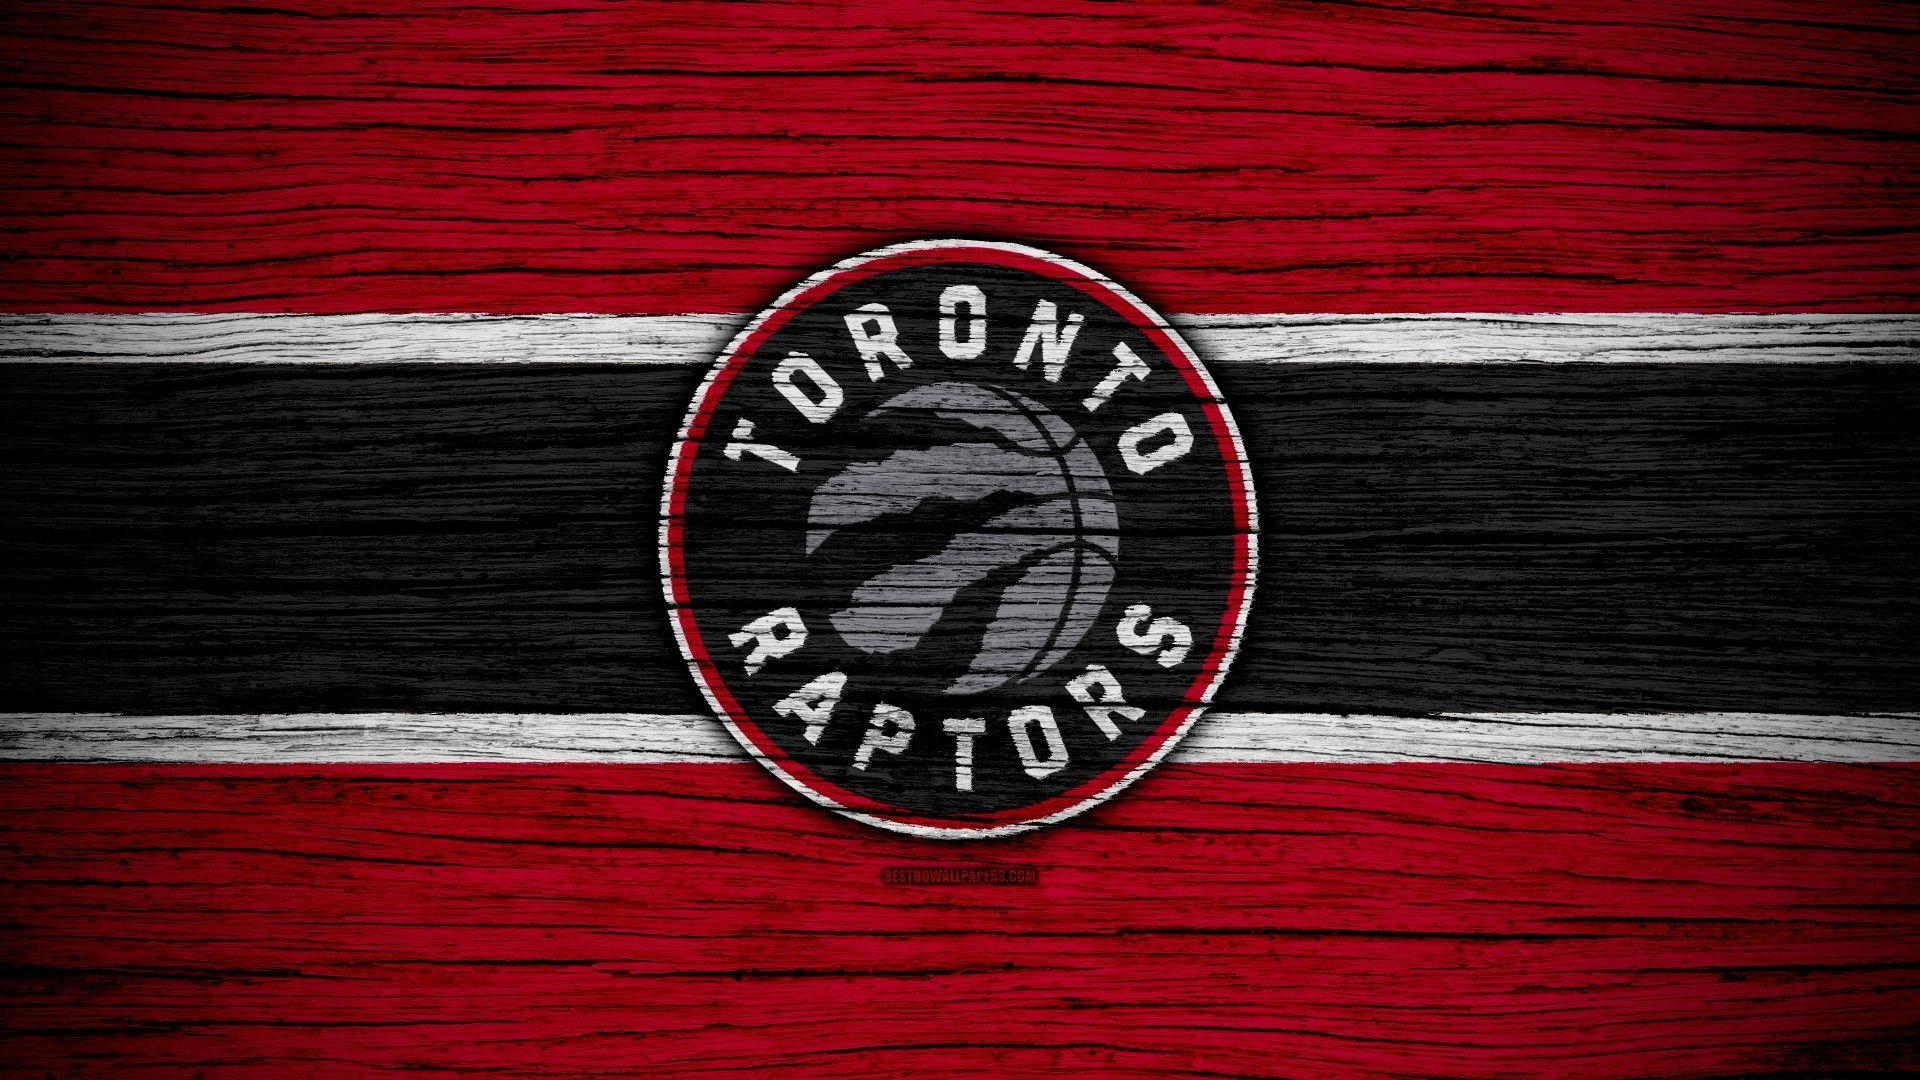 Toronto Raptors Hd Wallpapers Nba Teams Theme Toronto Raptors Textura De Madeira Nba